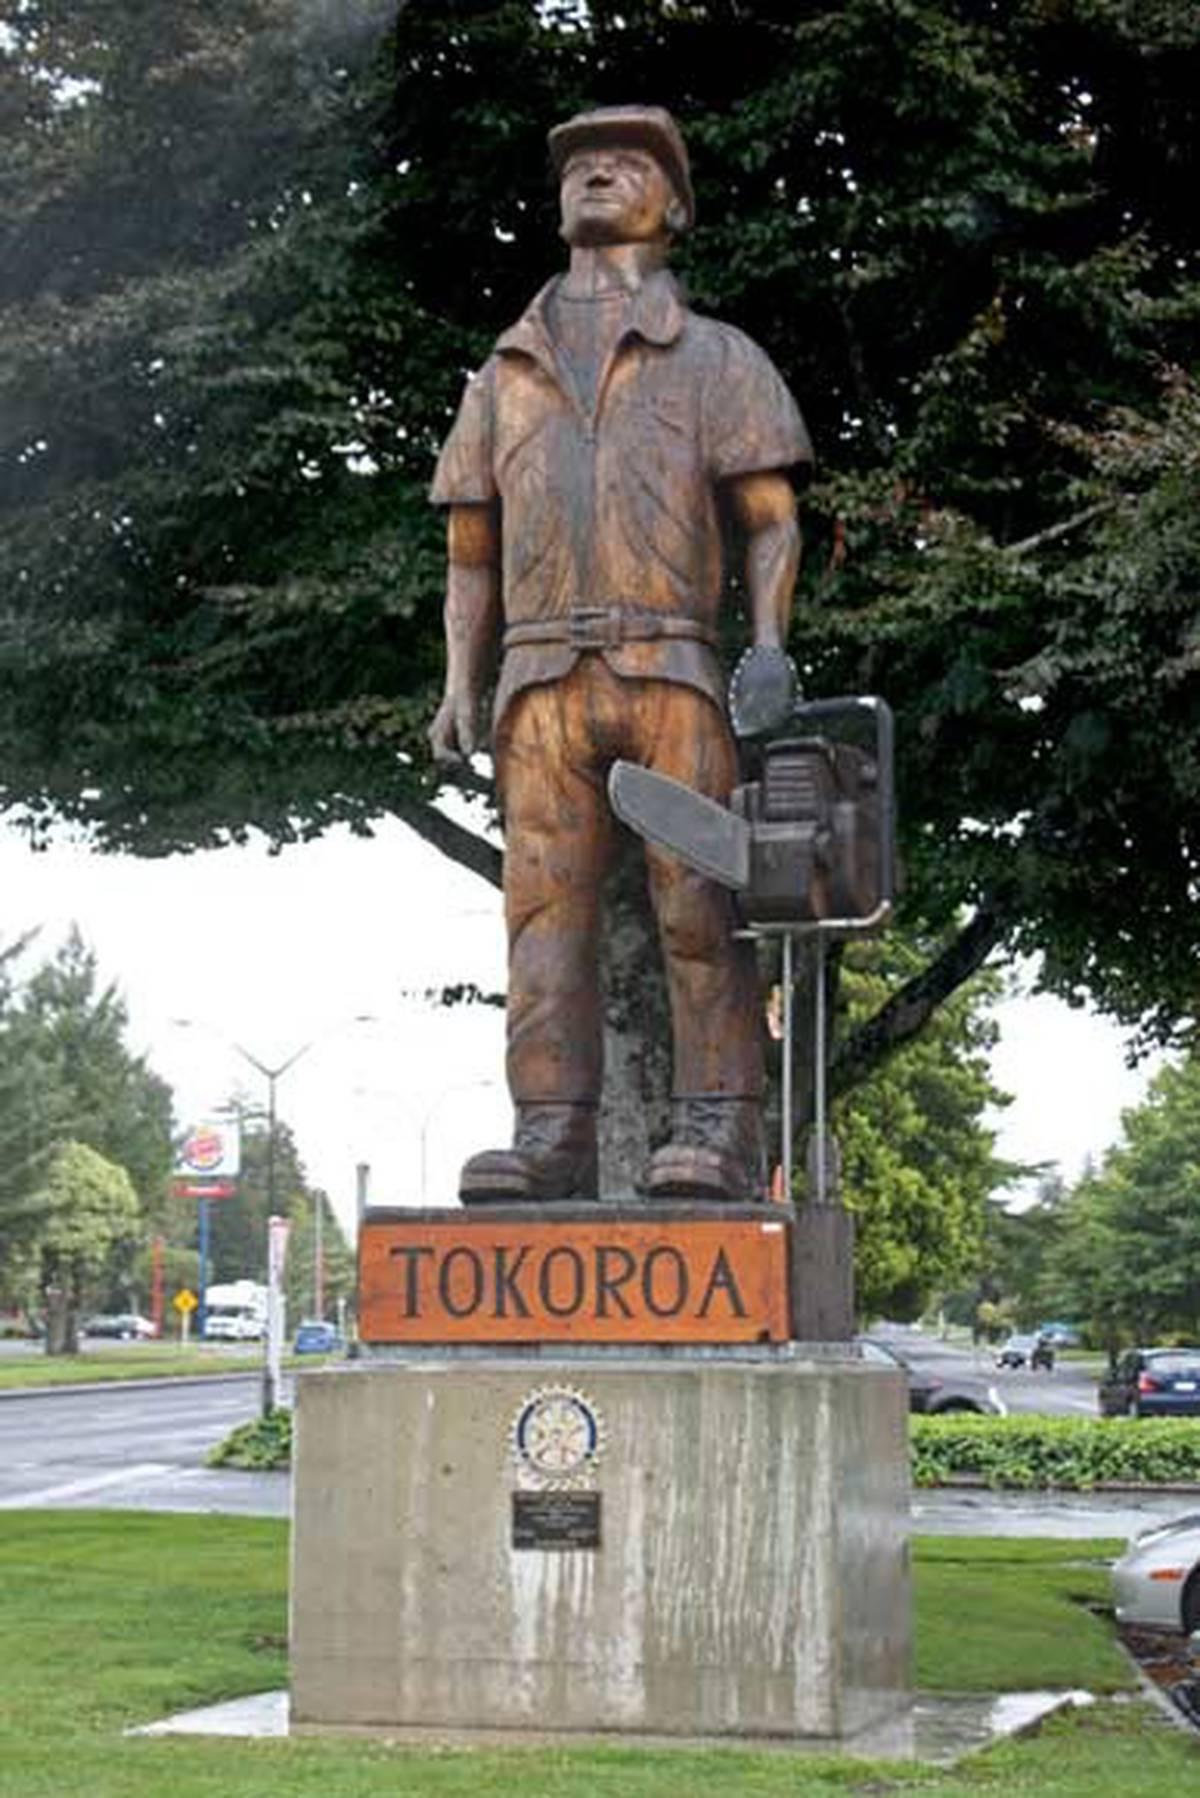 Man in hospital after Tokoroa stabbing